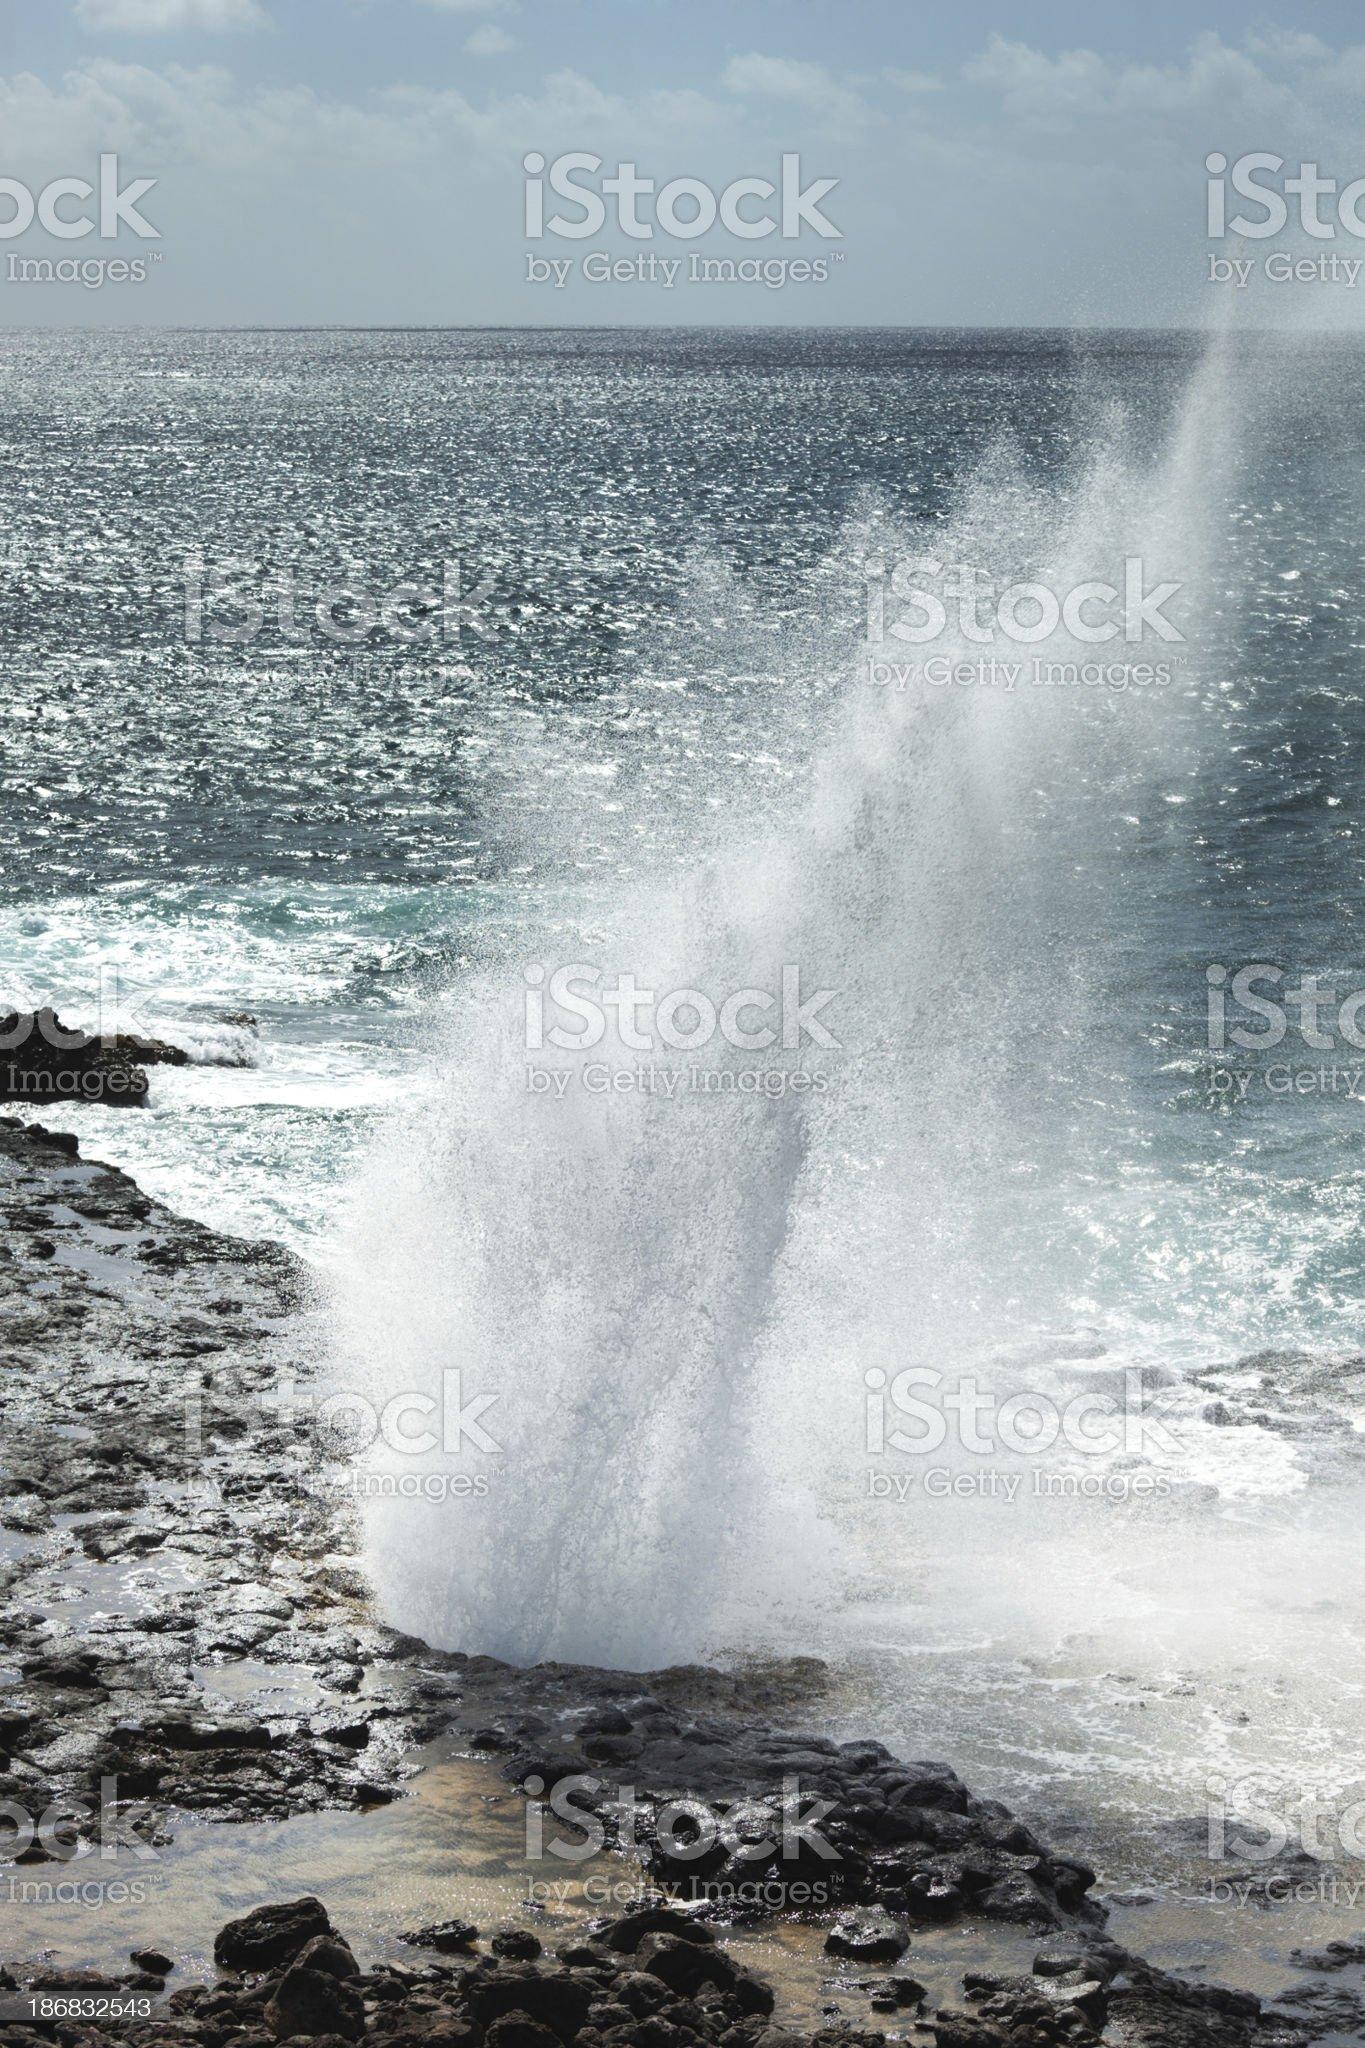 Spouting Horn of Kauai, Hawaii Vt royalty-free stock photo